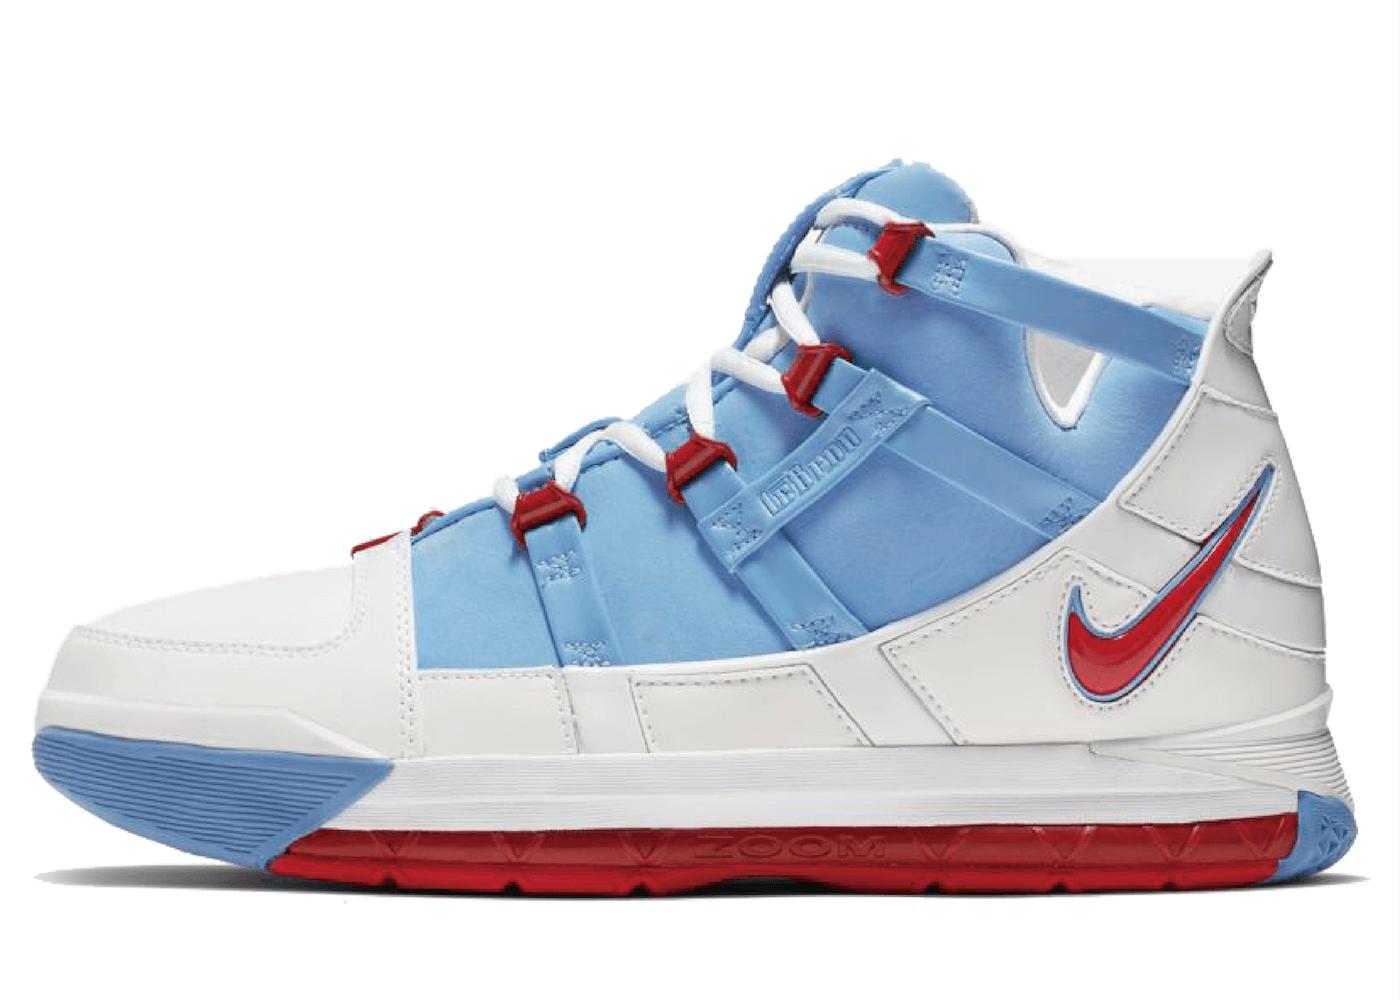 Nike LeBron 3 Houstonの写真